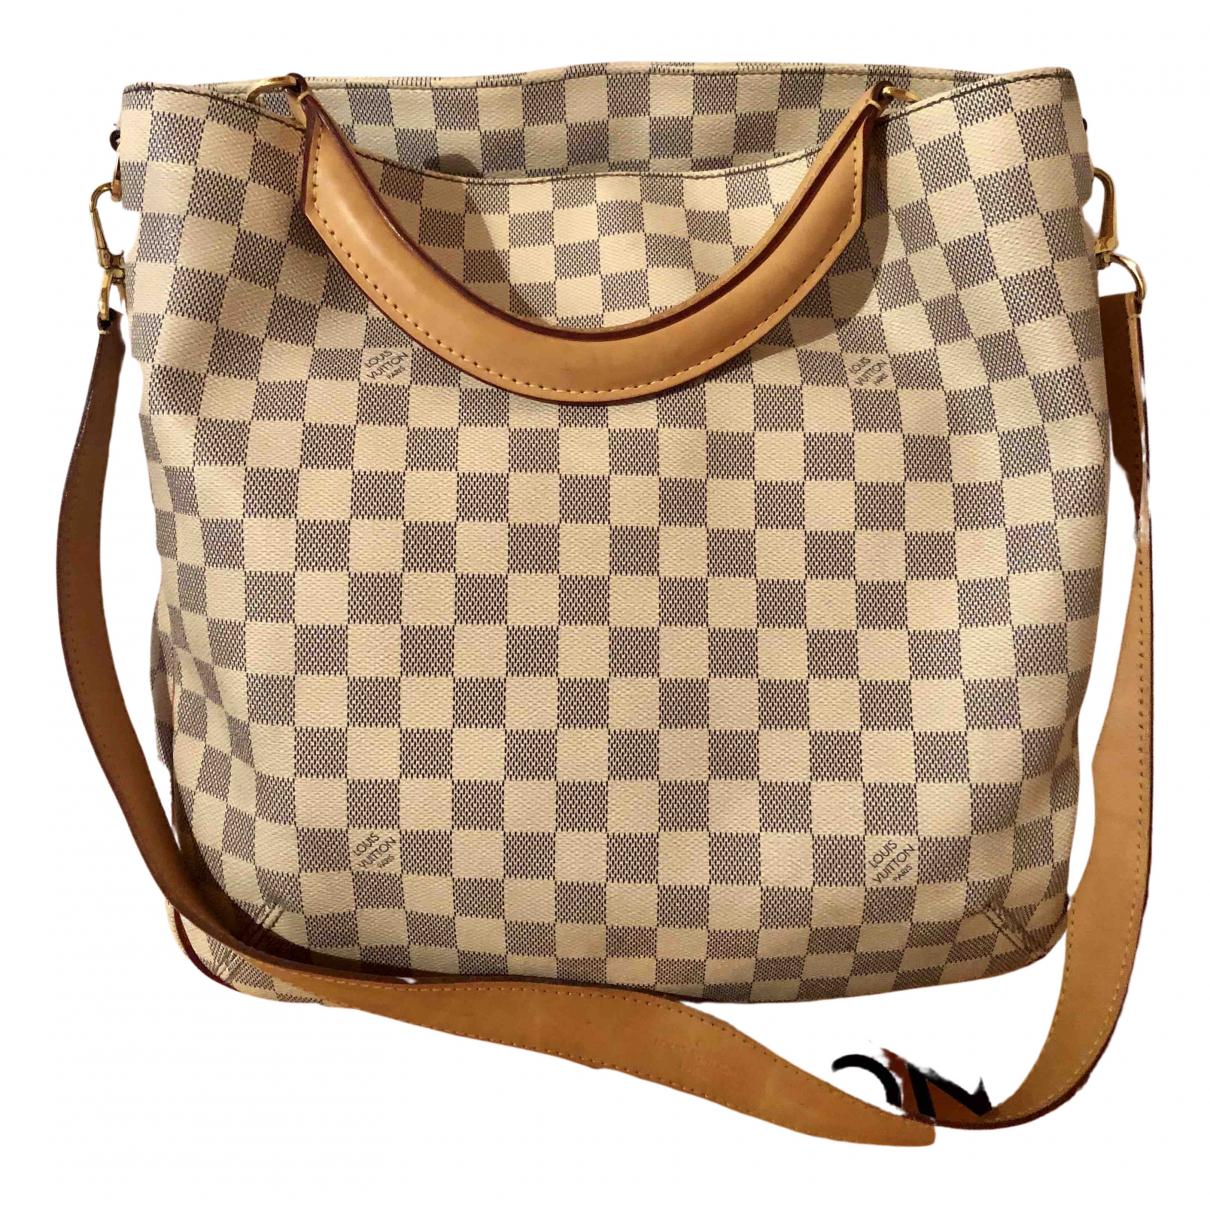 Louis Vuitton Soffi Ecru Cloth handbag for Women N